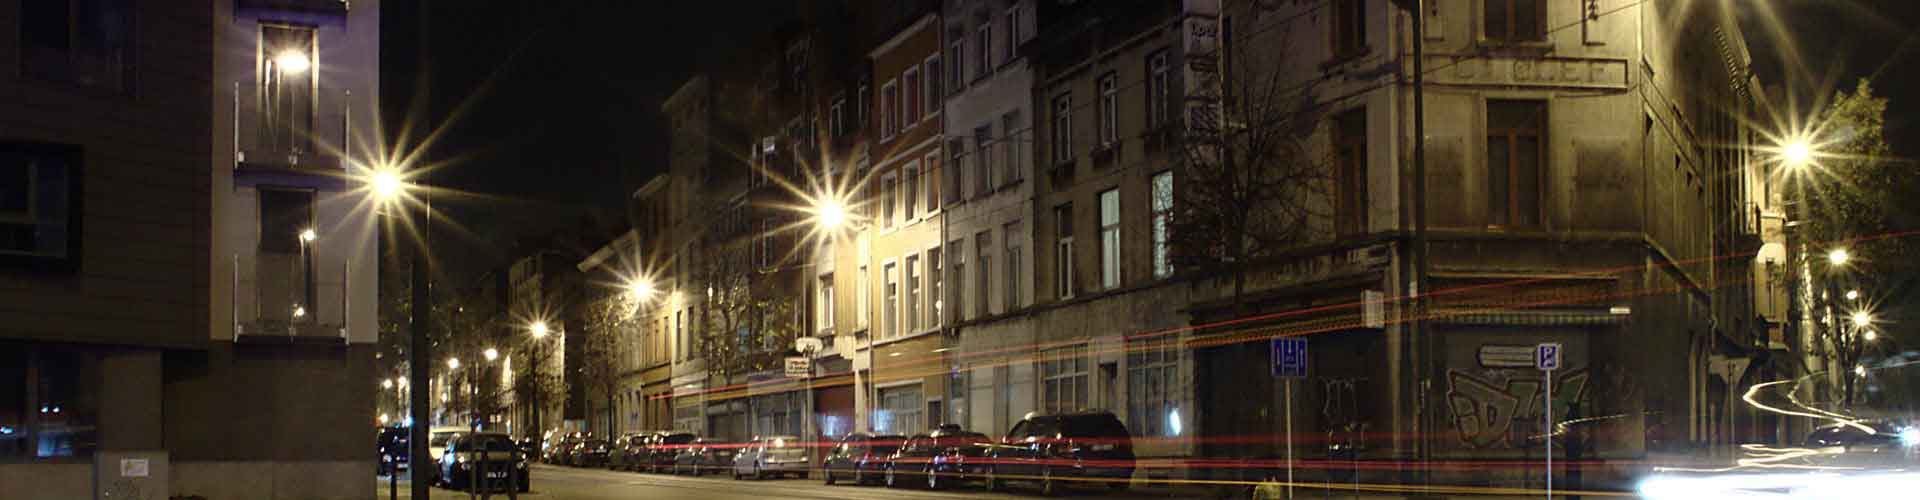 Bruxelles – Ostelli nella Molenbeek-Saint-Jean zona. Mappe per Bruxelles, Foto e Recensioni per ogni ostello a Bruxelles.